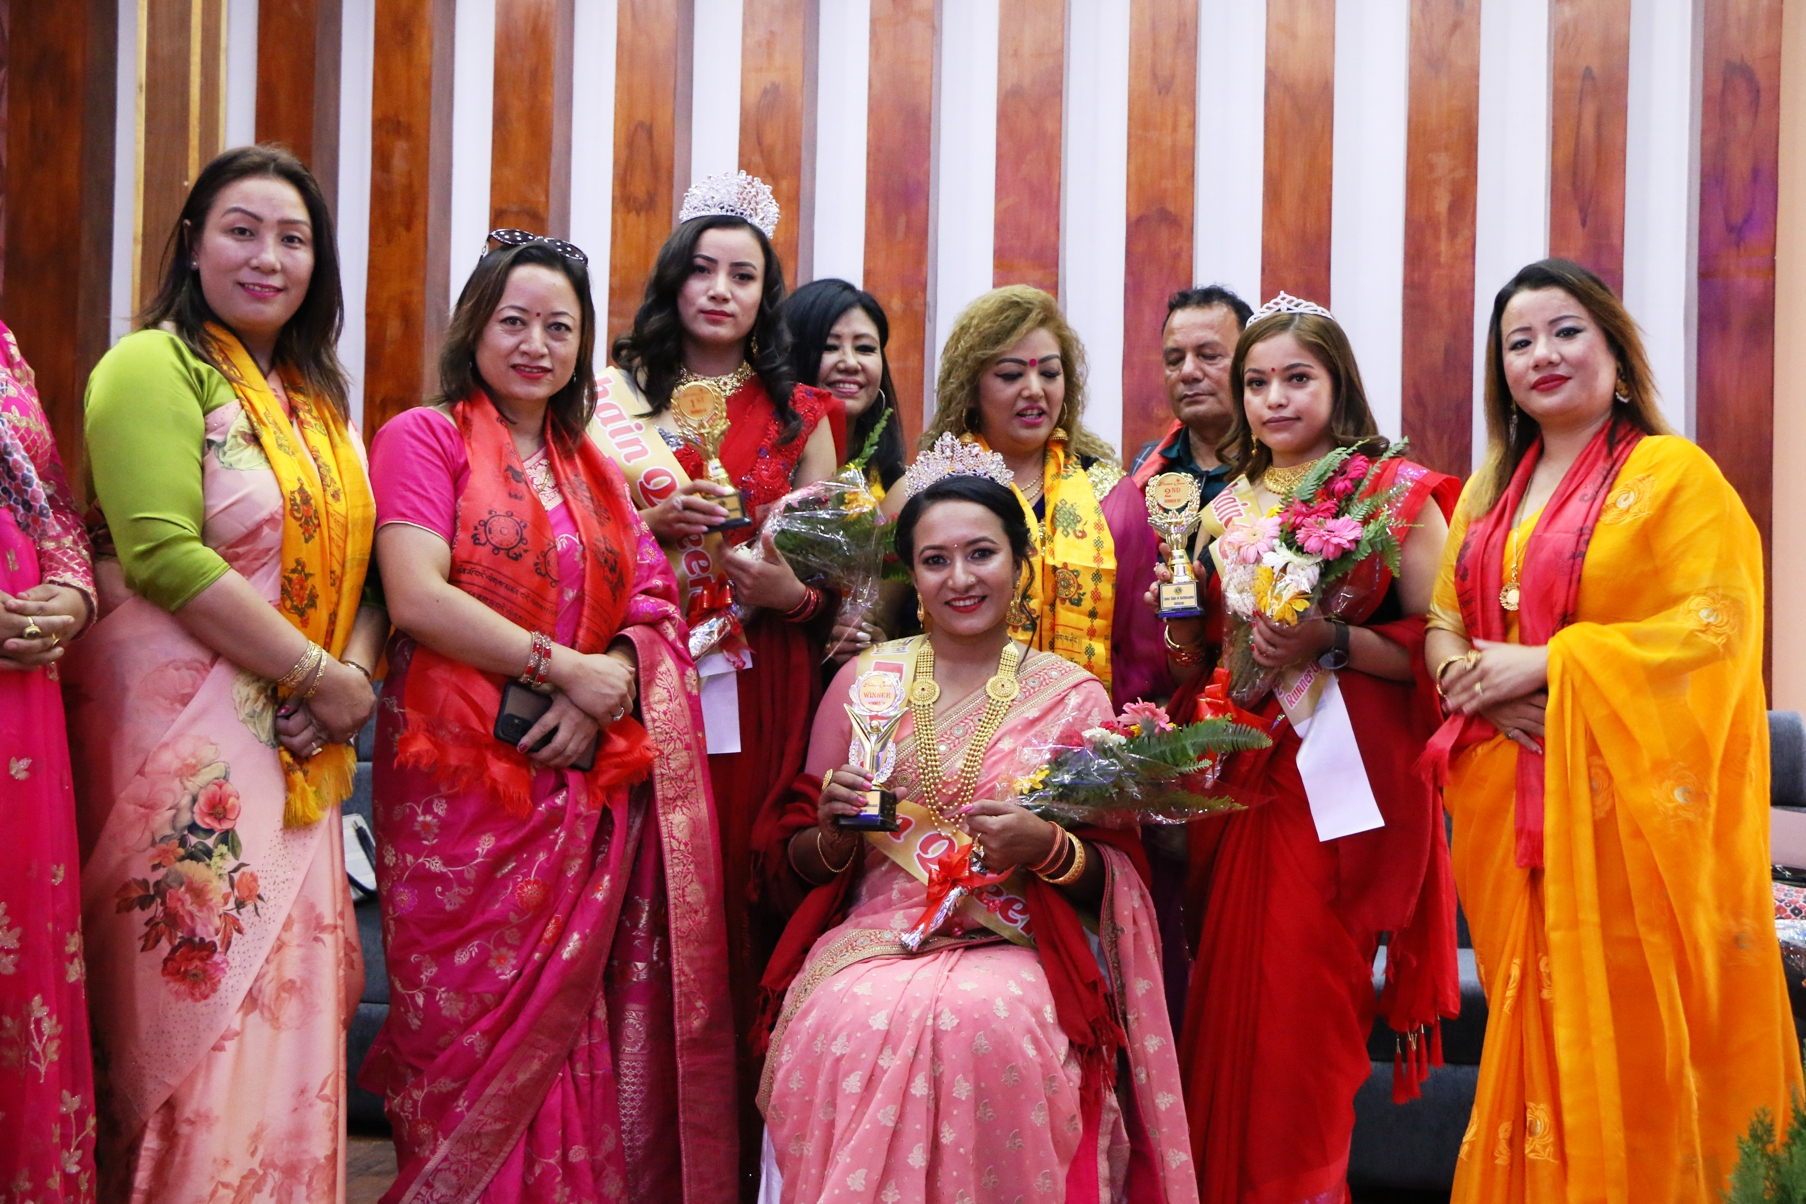 अन्जु बुढाथोकी बनिन दशैँ क्विन-२०७८ को बिजेता